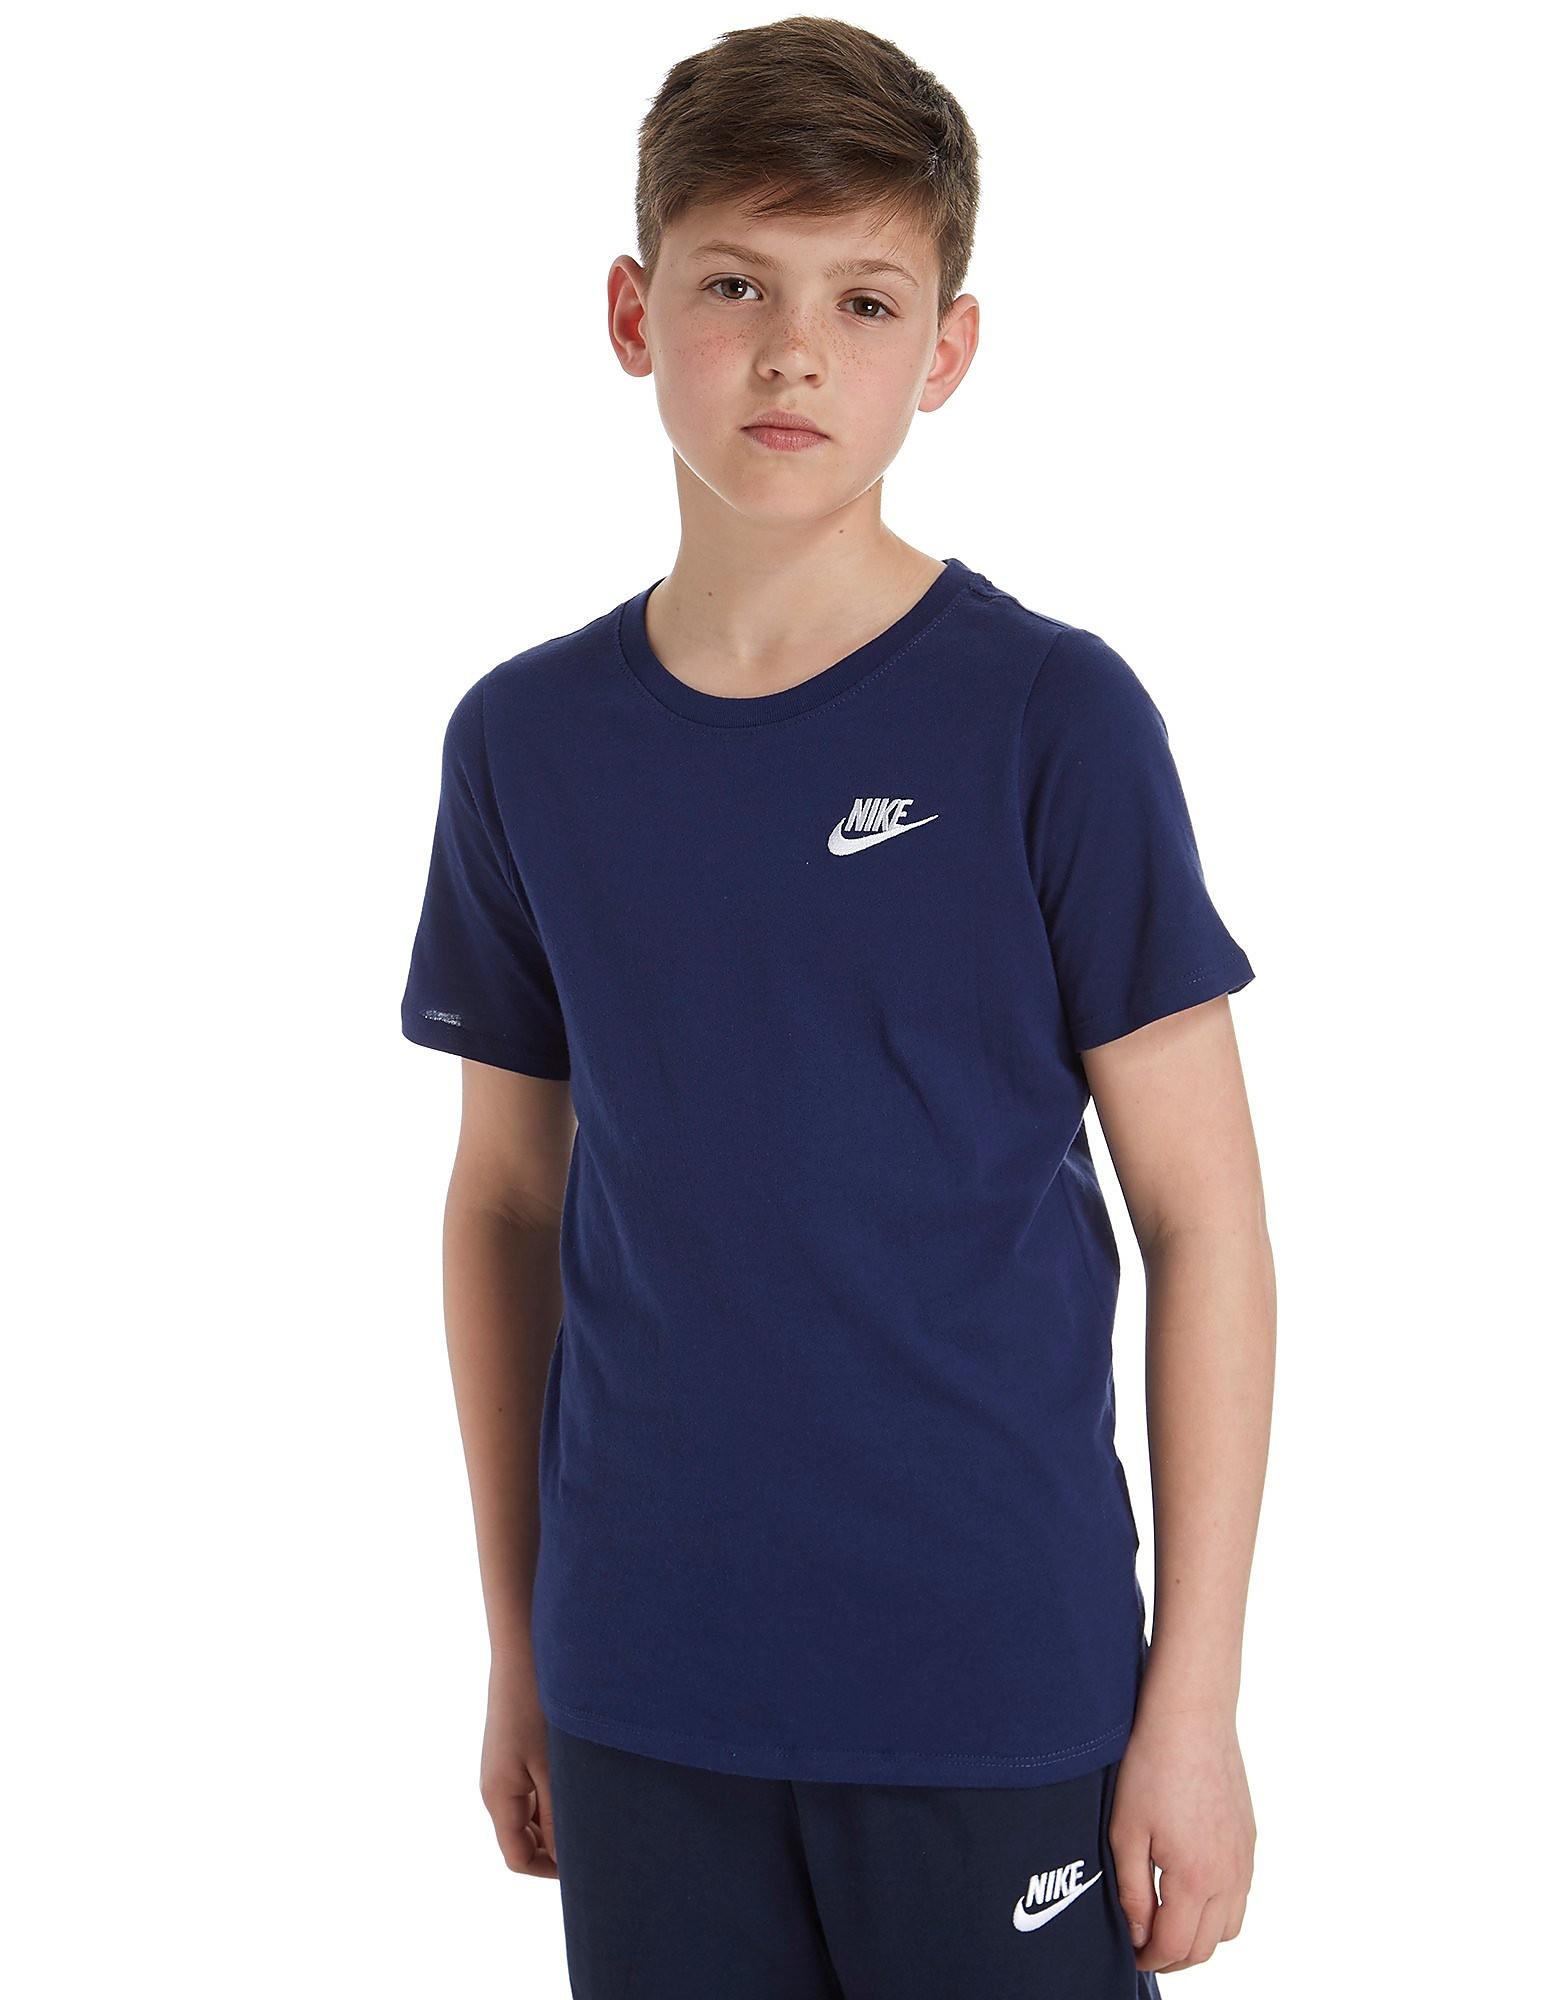 Nike Franchise Kinder-T-Shirt